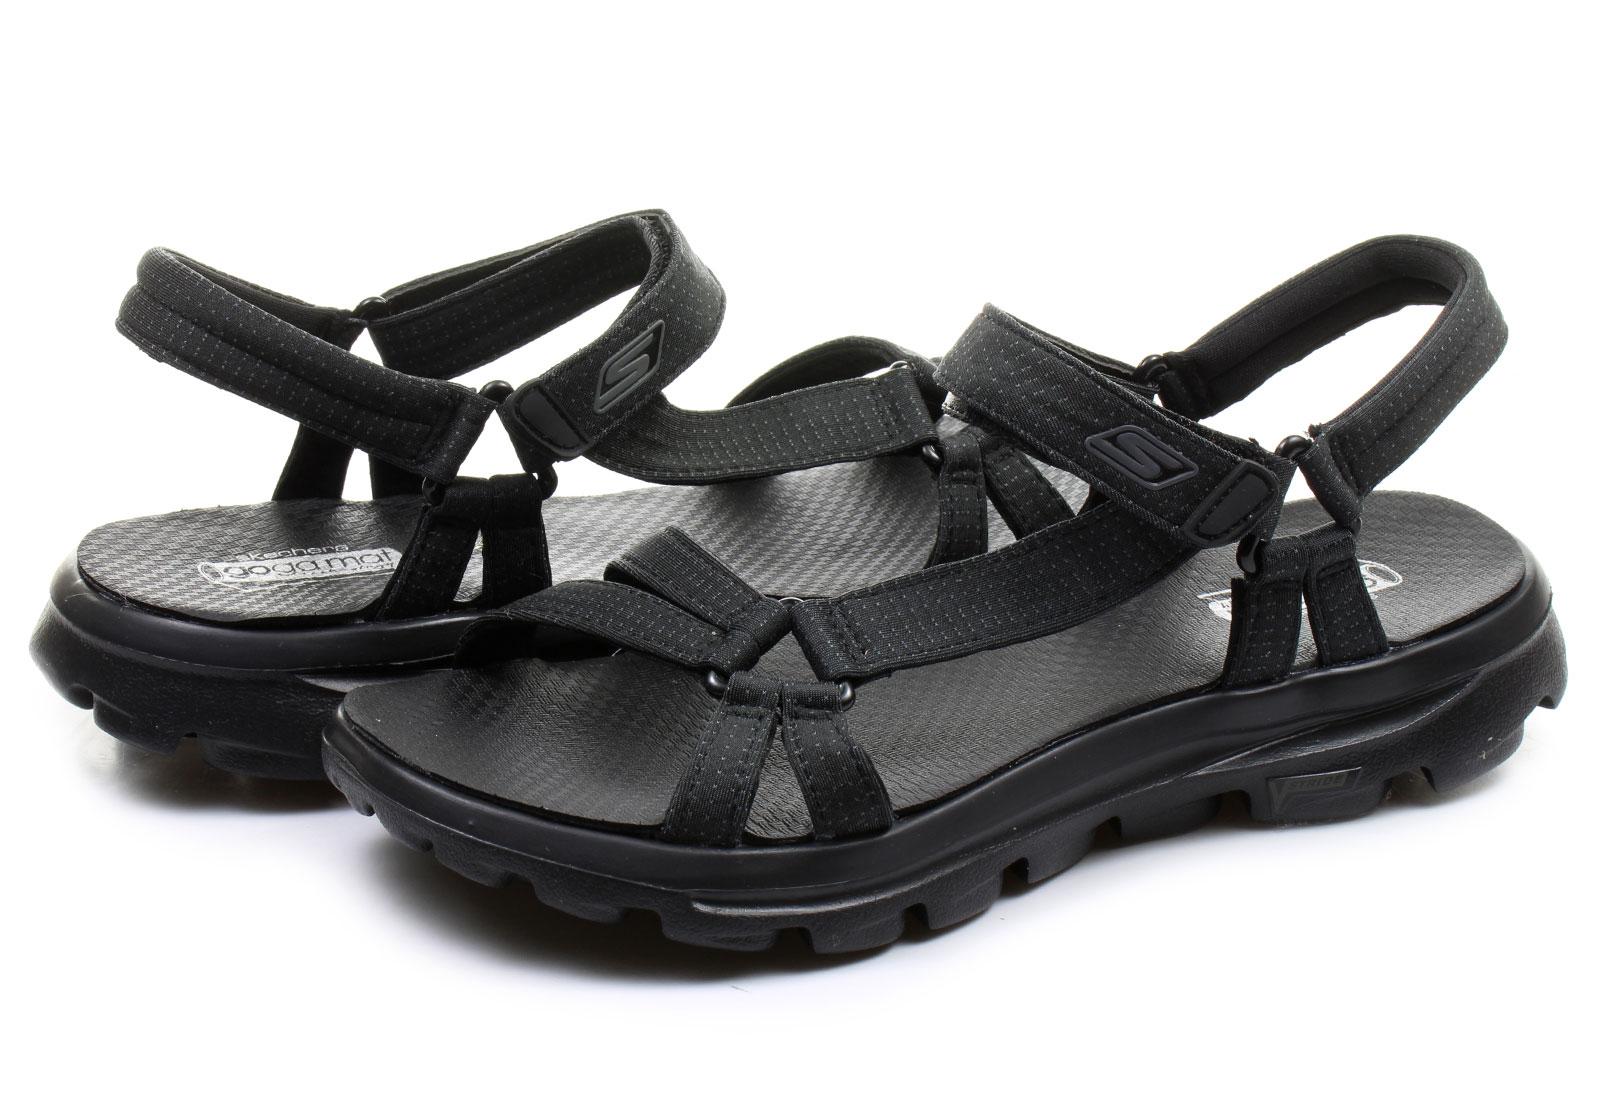 Skechers Sandals River Walk 14245 Bbk Online Shop